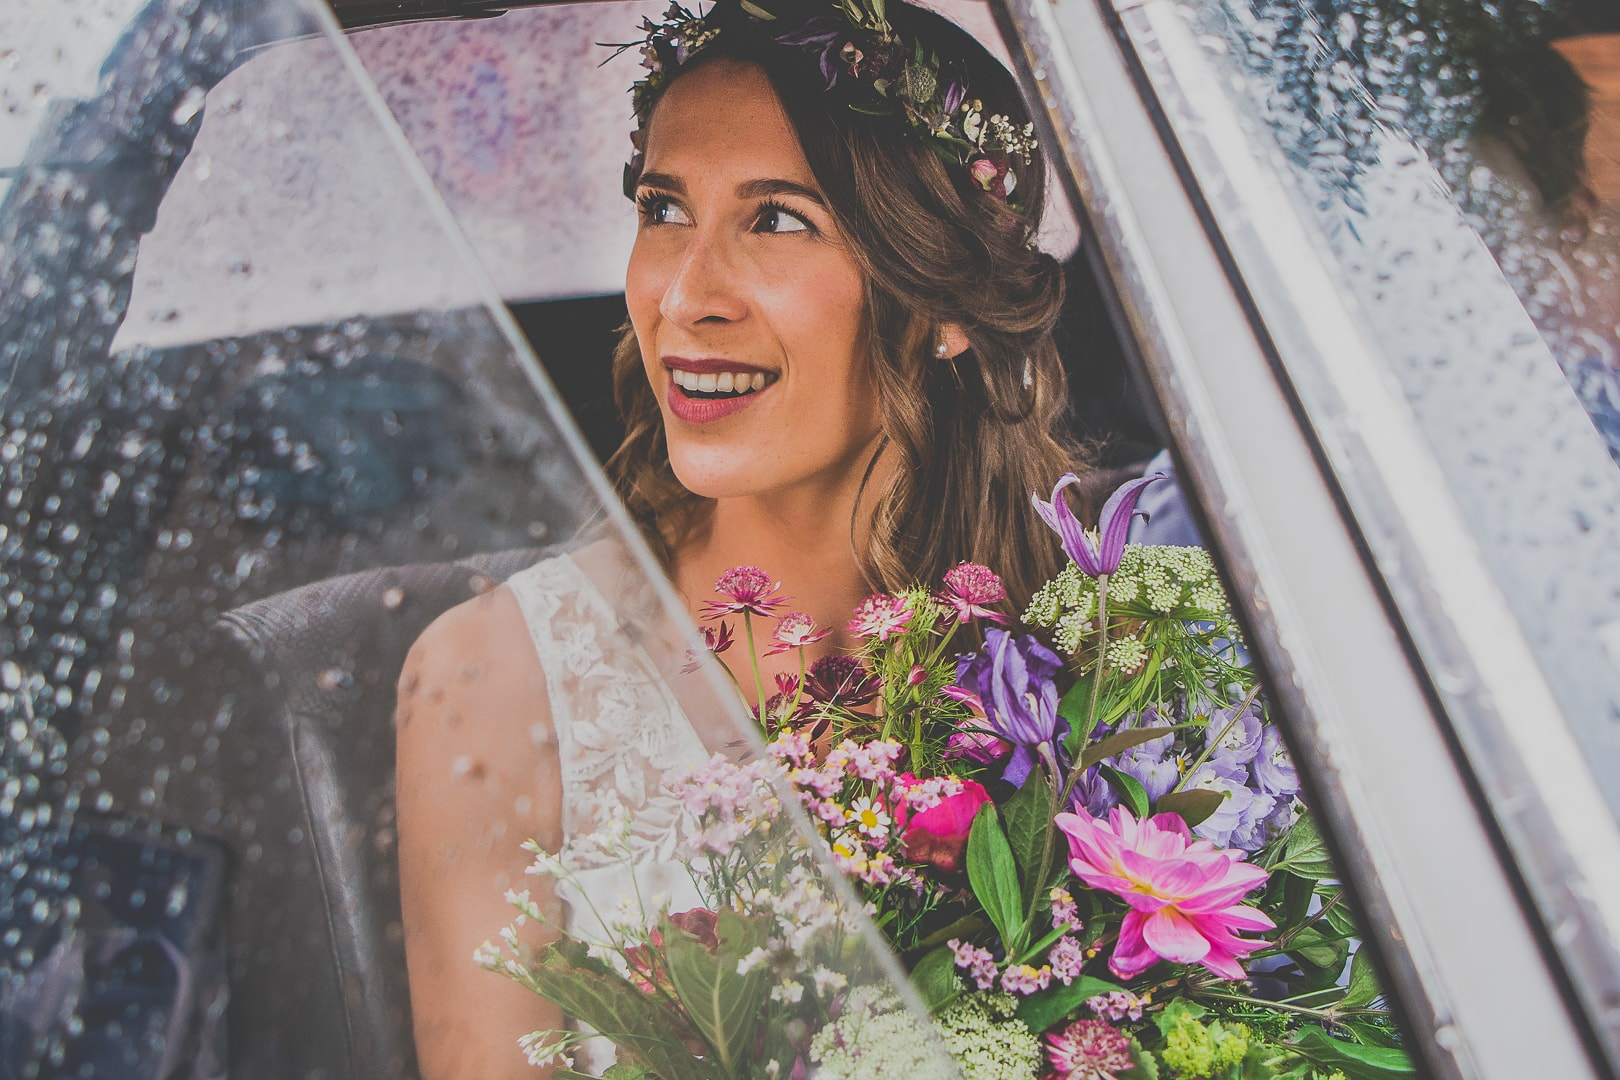 trezors-photography-photographe-professionnel-toulouse-31-mariage-reportage-photo-lifestyle (29)